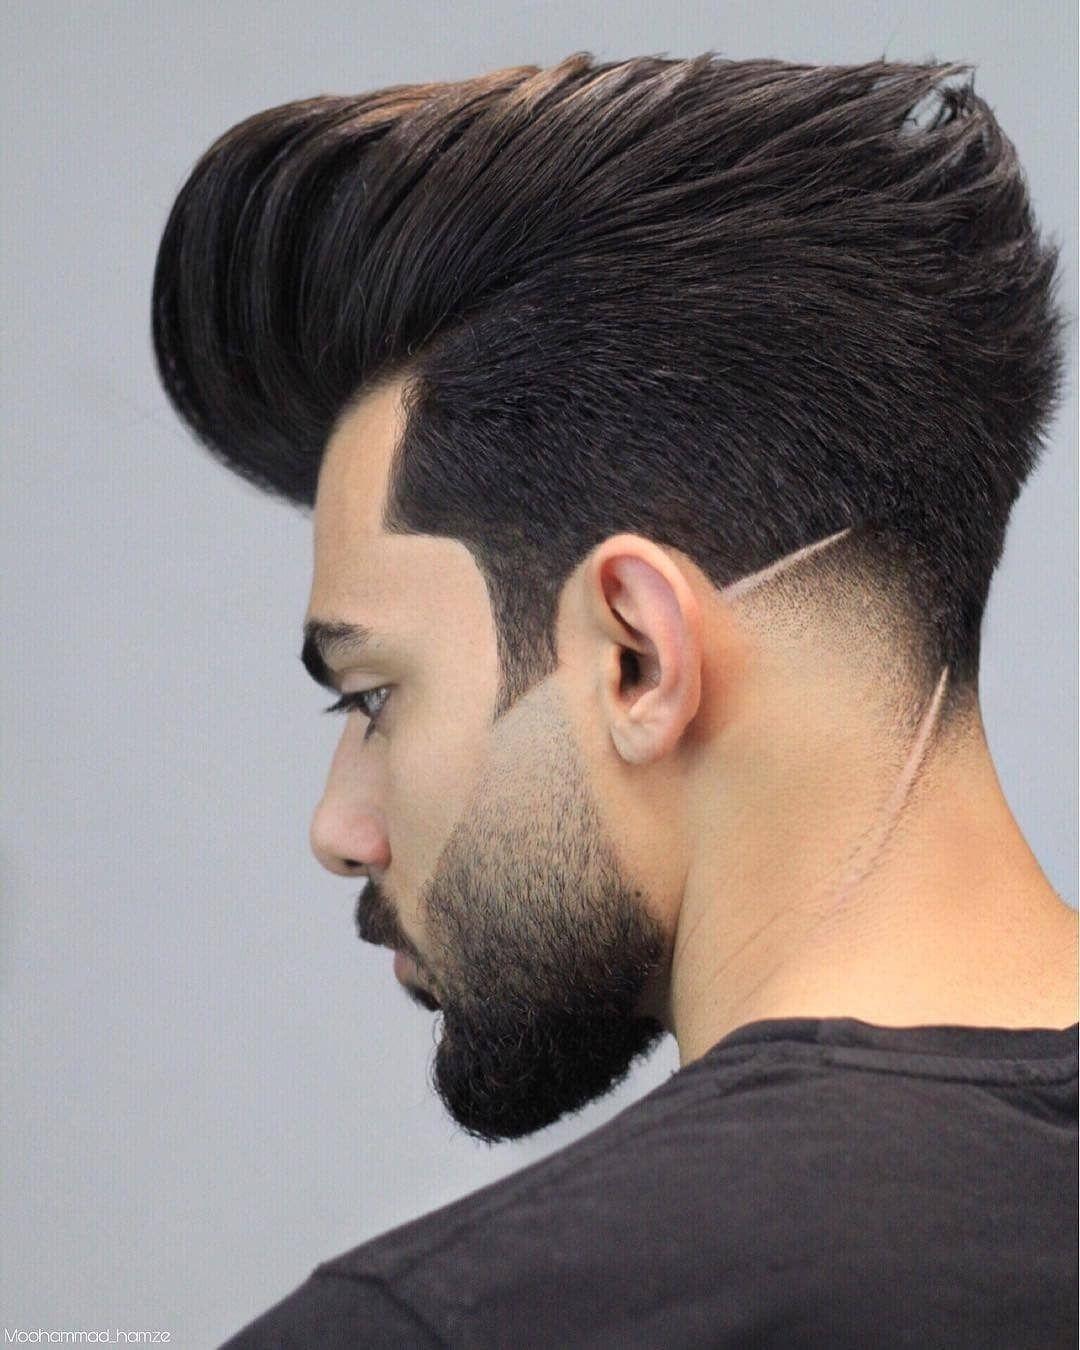 Pin By Jorge Molina Rivero On Barba Long Hair Styles Men Mens Facial Hair Styles Ducktail Haircut